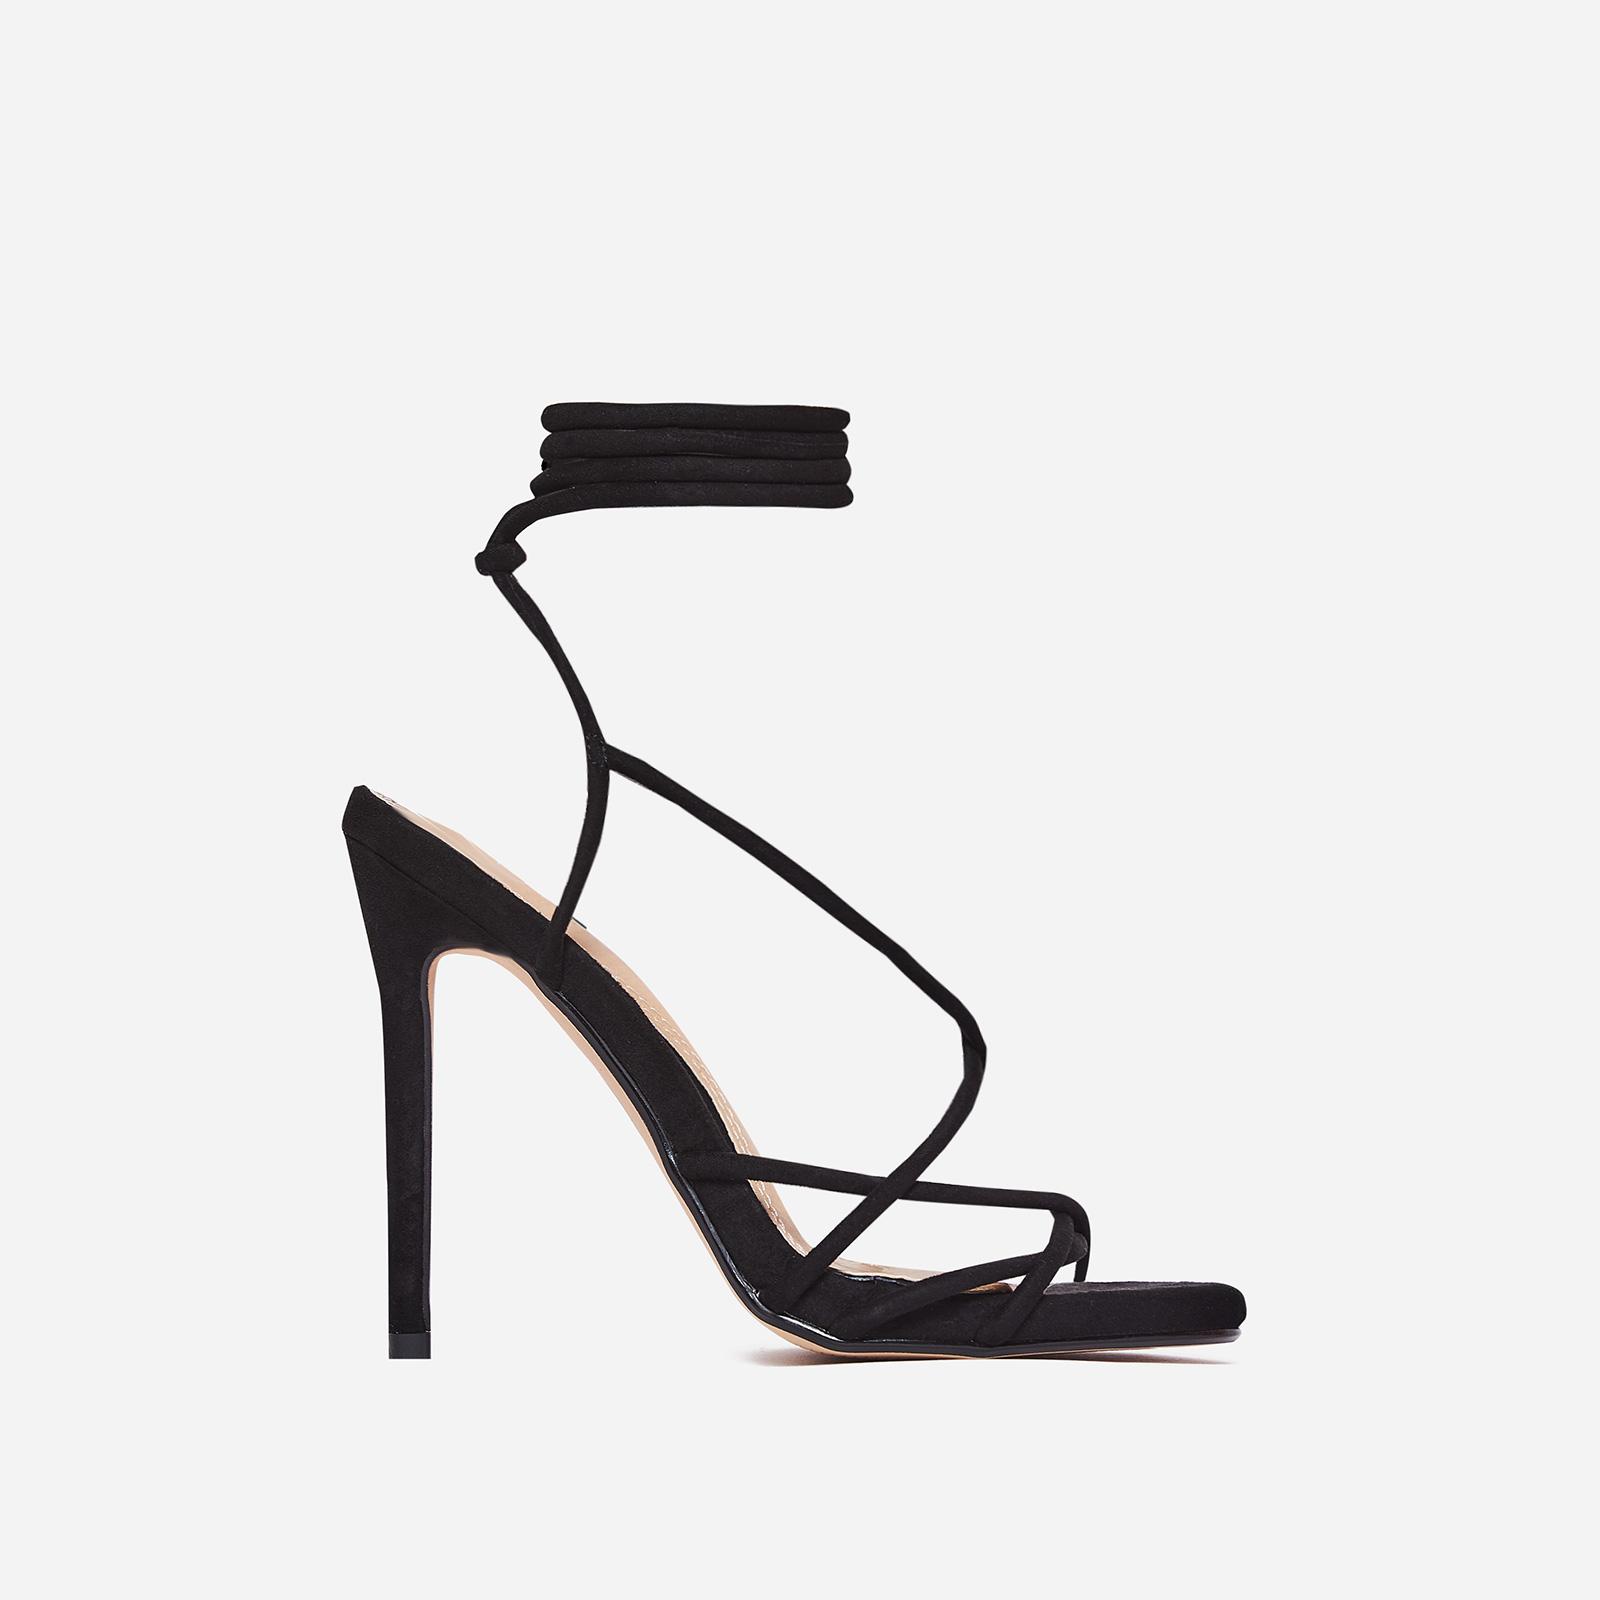 Gilda Lace Up Heel In Black Faux Suede